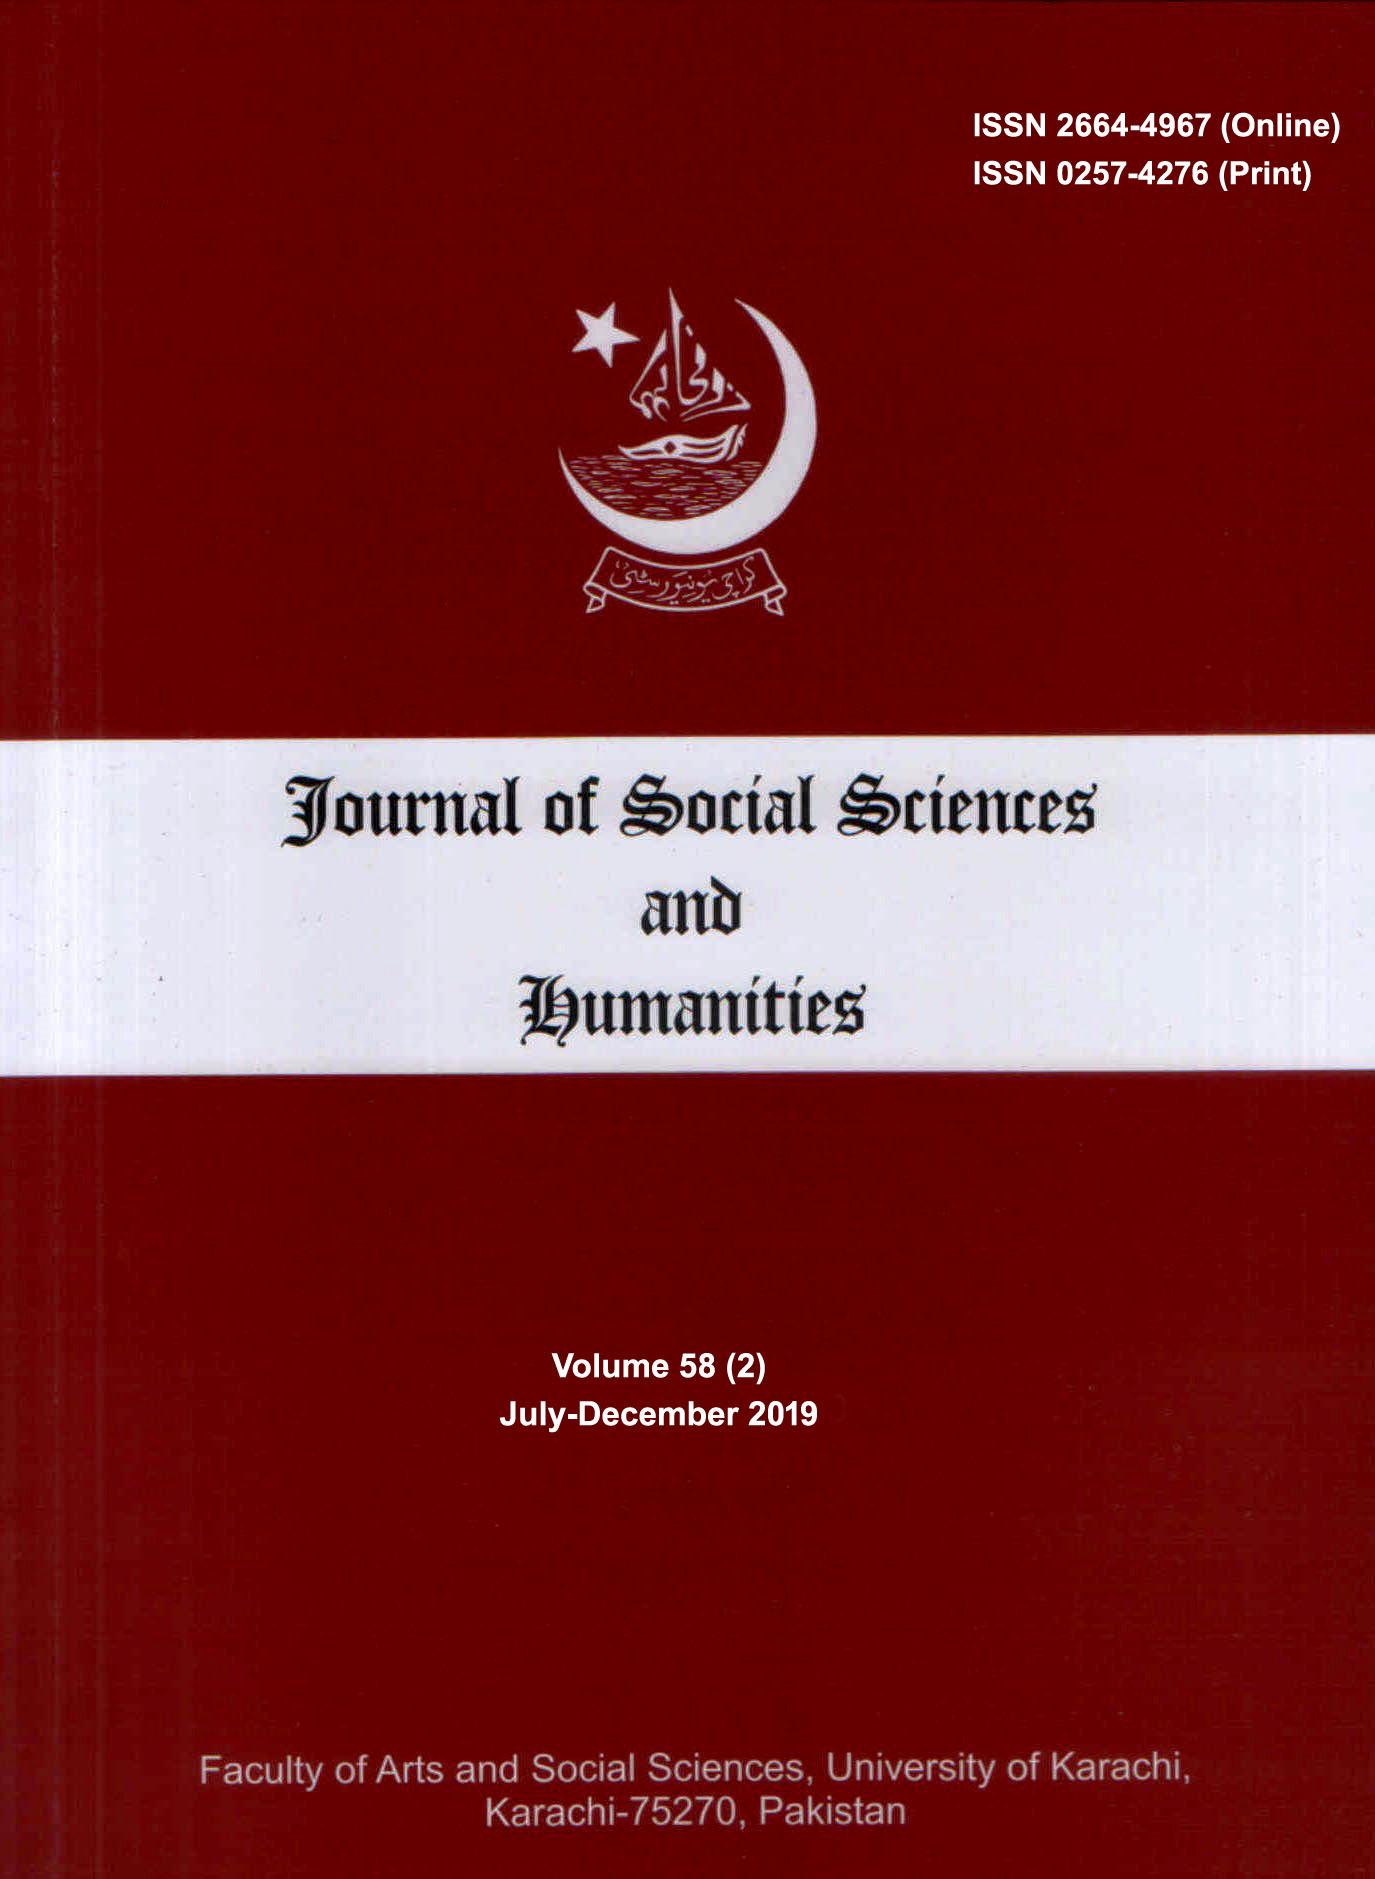 View Vol. 58 No. 2 (2019): JOURNAL OF SOCIAL SCIENCES AND HUMANITIES, UNIVERSITY OF KARACHI